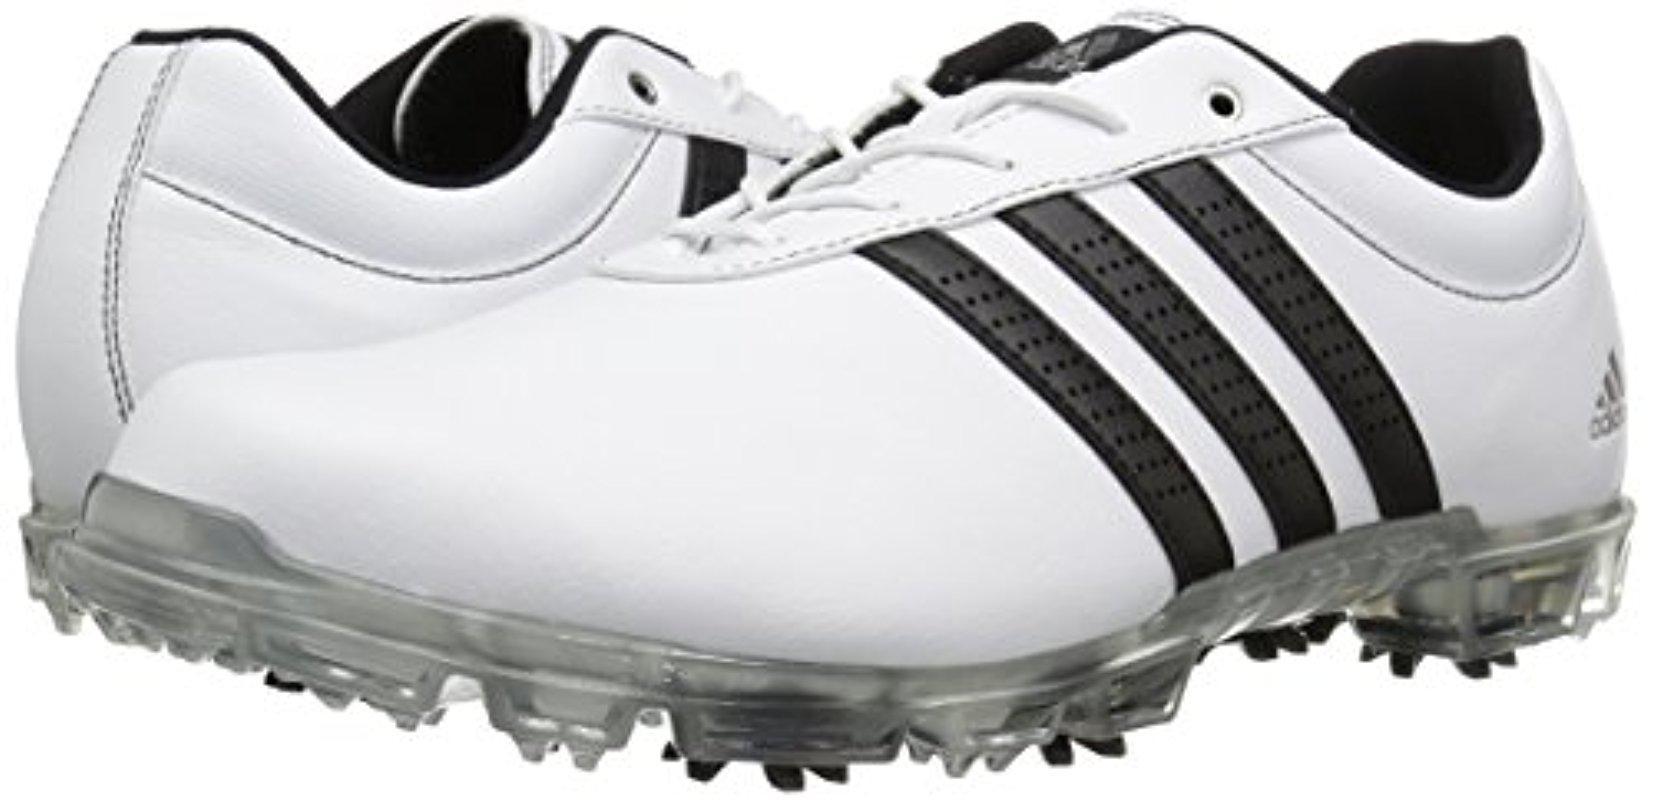 Adipure Flex Golf Shoe